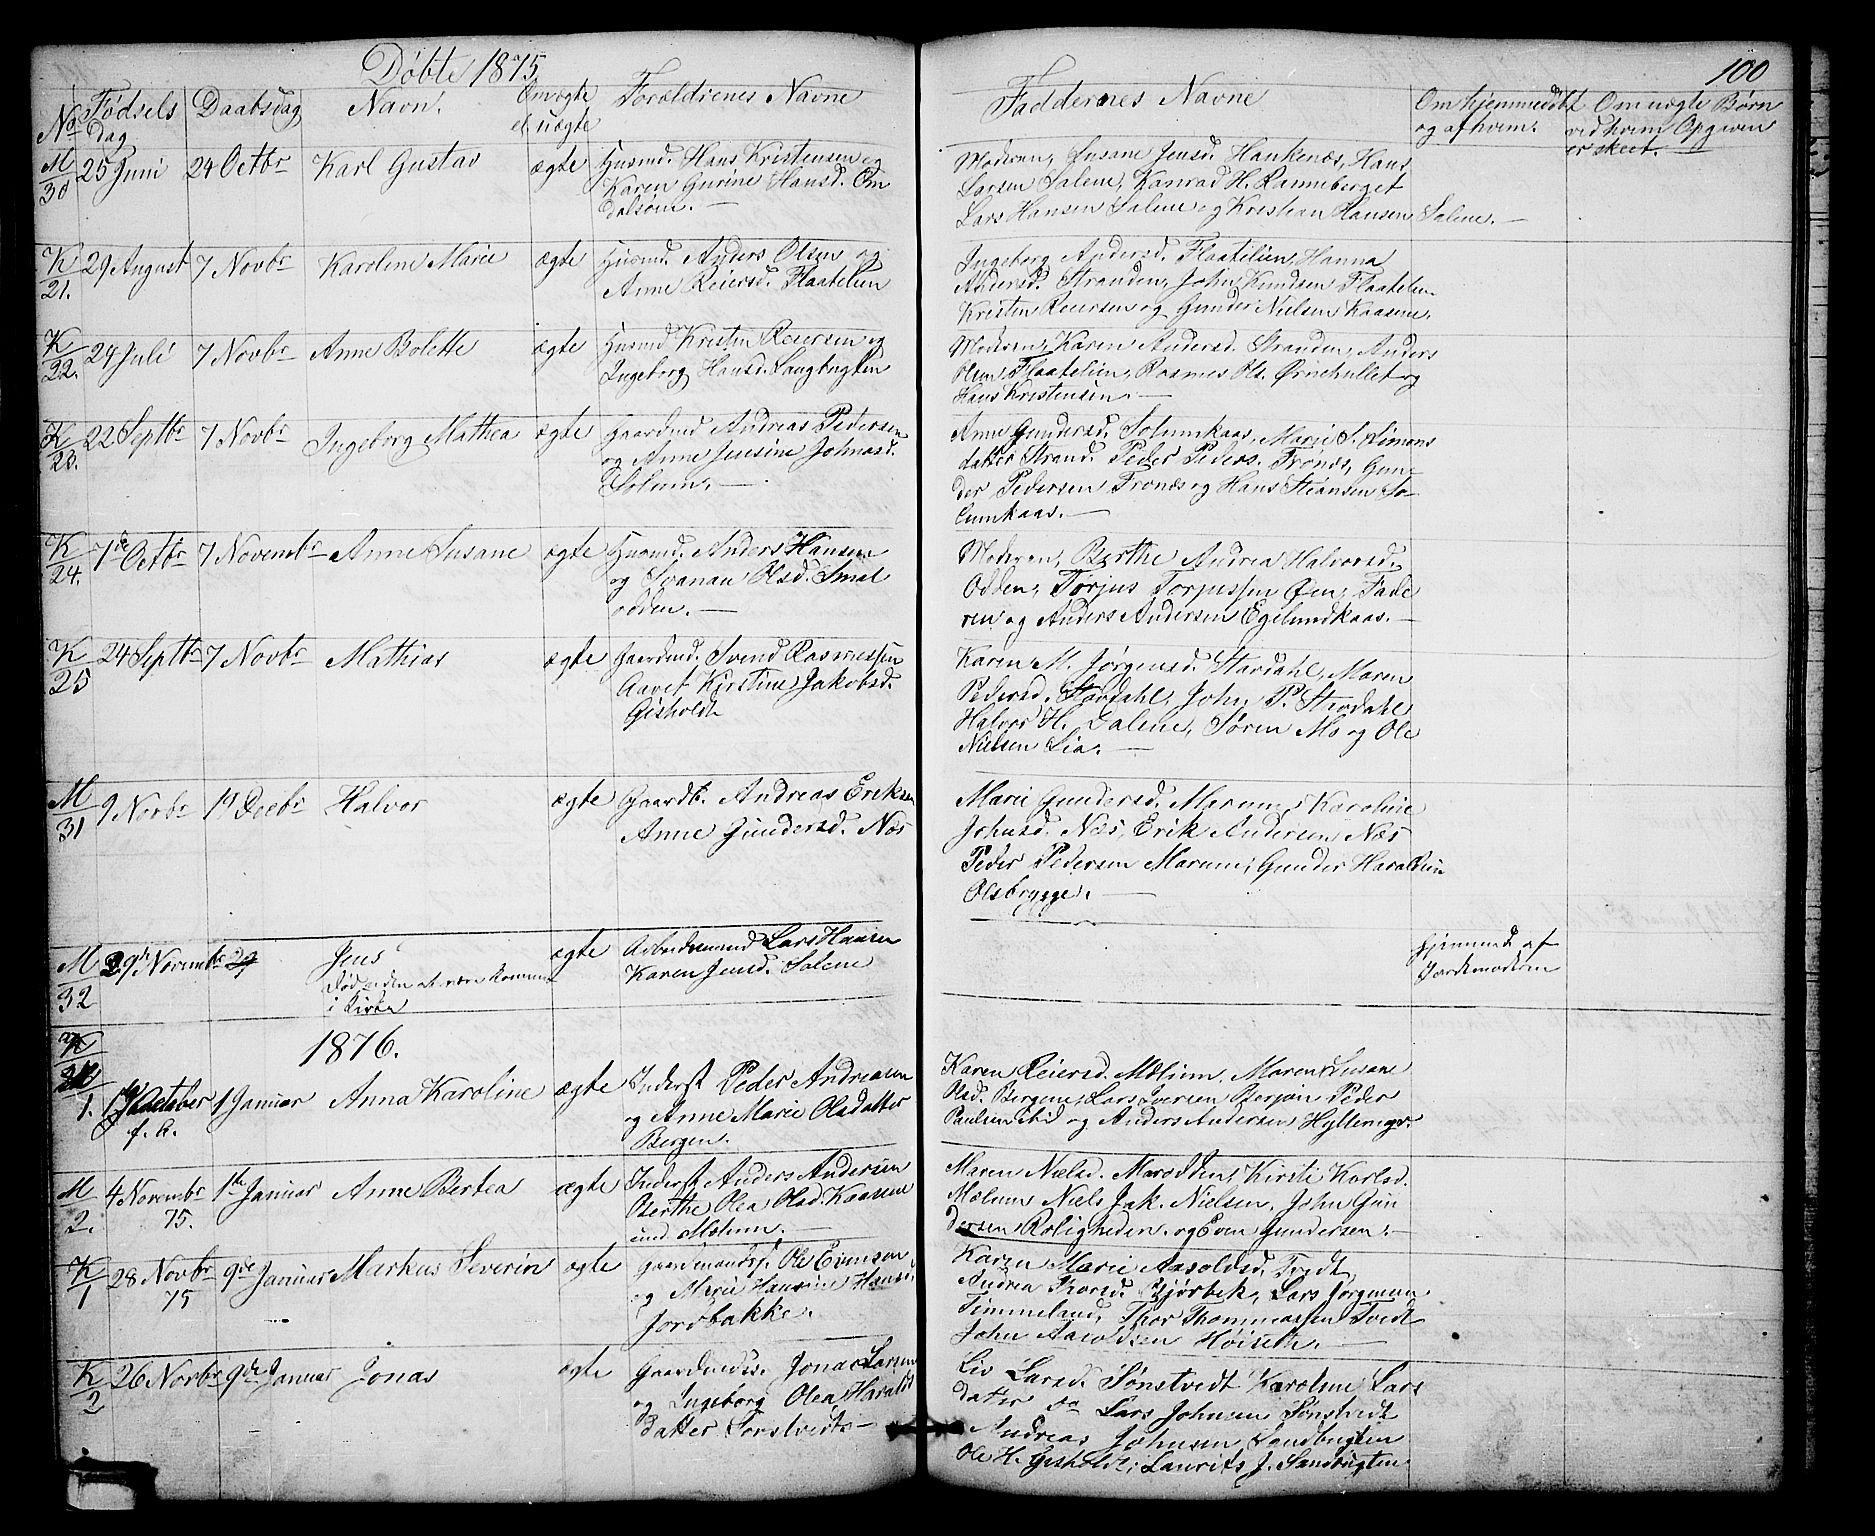 SAKO, Solum kirkebøker, G/Gb/L0002: Klokkerbok nr. II 2, 1859-1879, s. 100